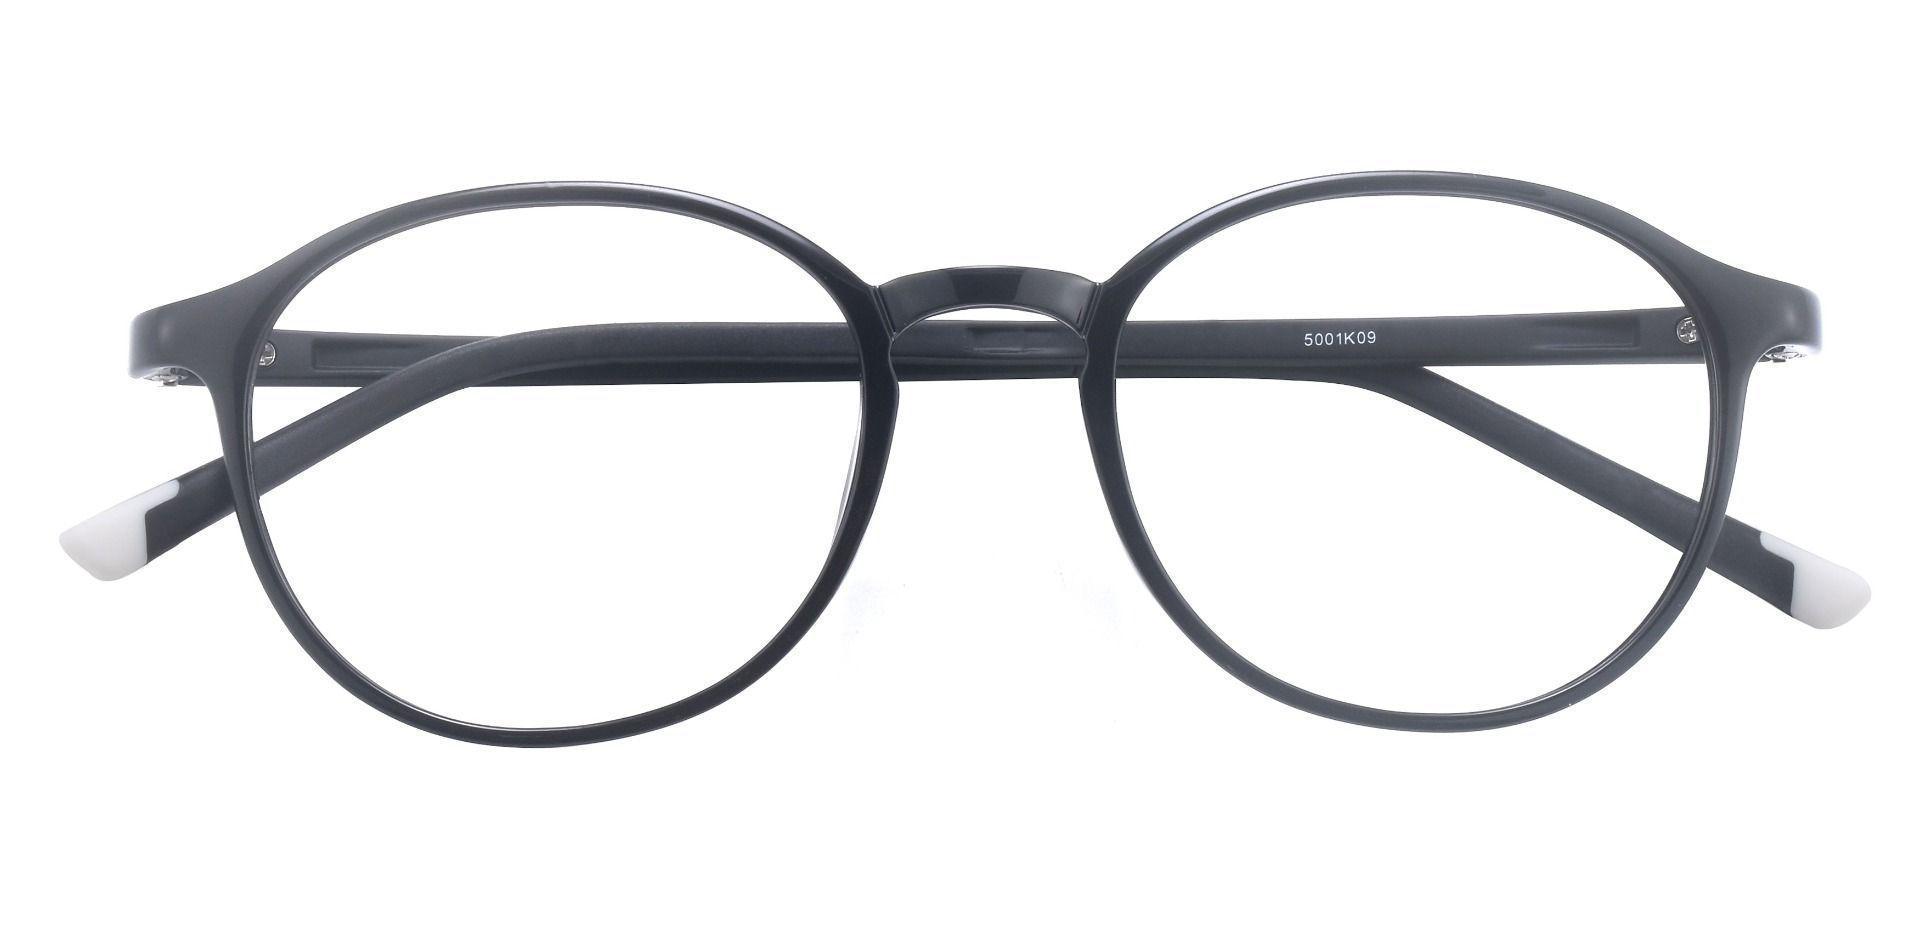 Agave Oval Prescription Glasses - Black